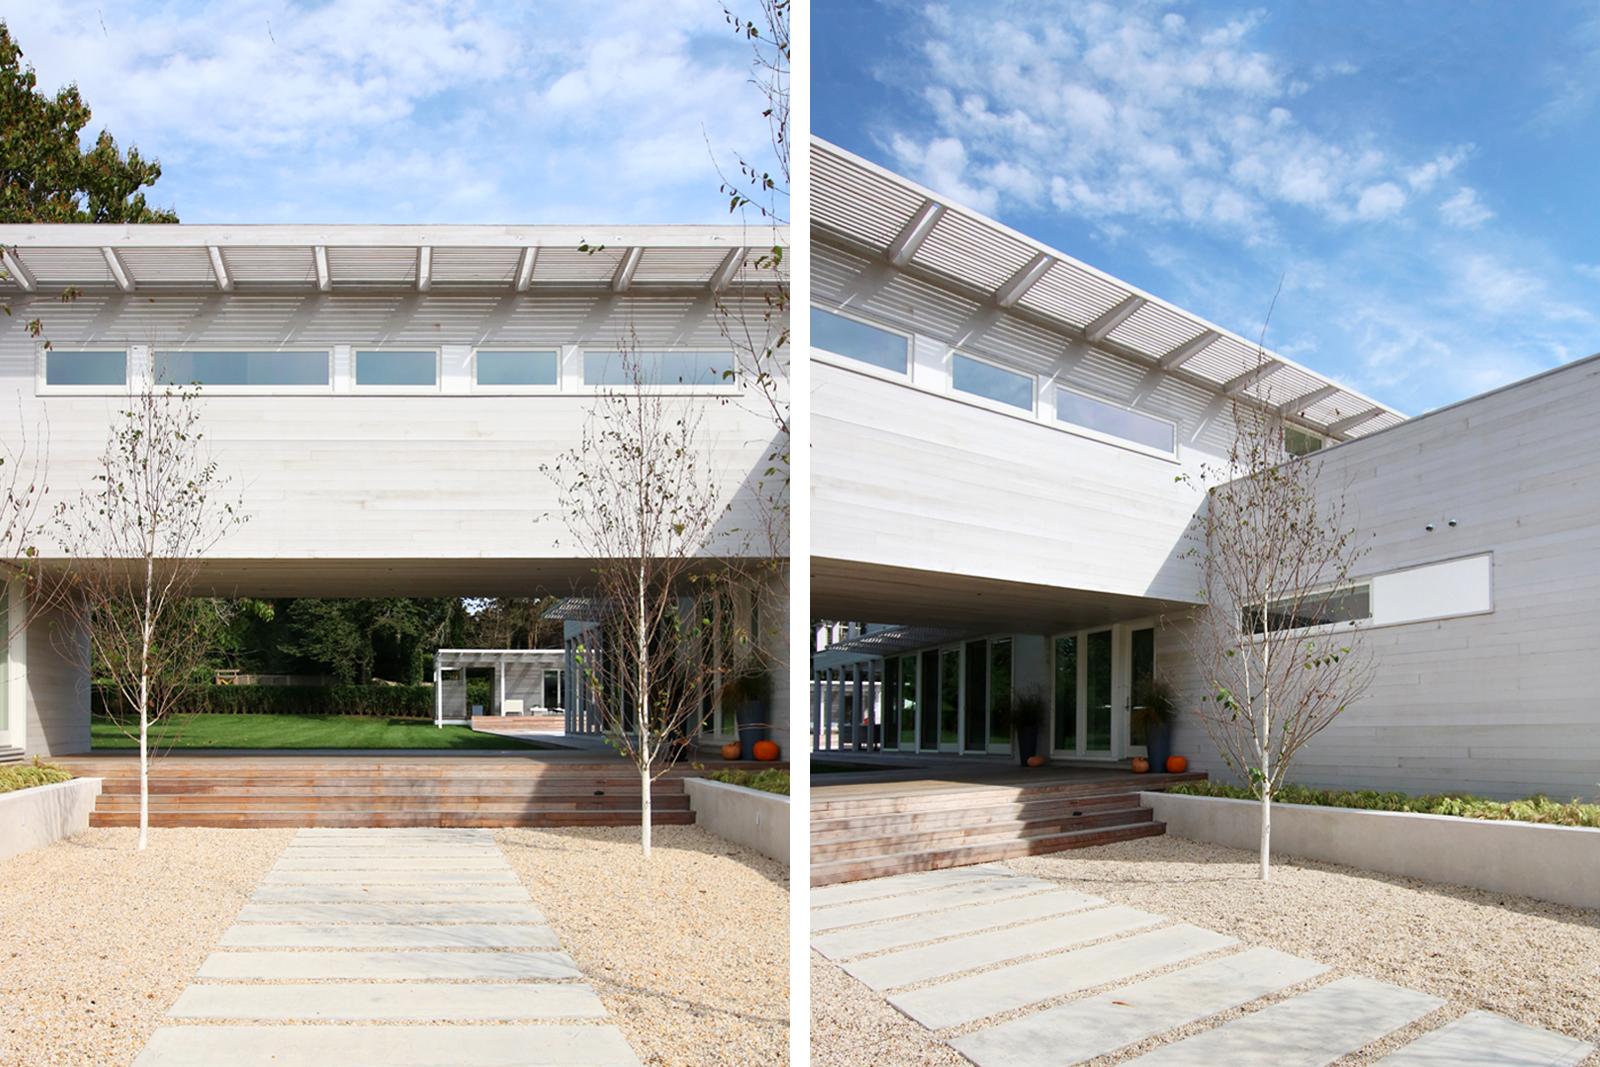 6-re4a-resolution-4-architecture-modern-modular-prefab-bridgehampton house-exterior.jpg